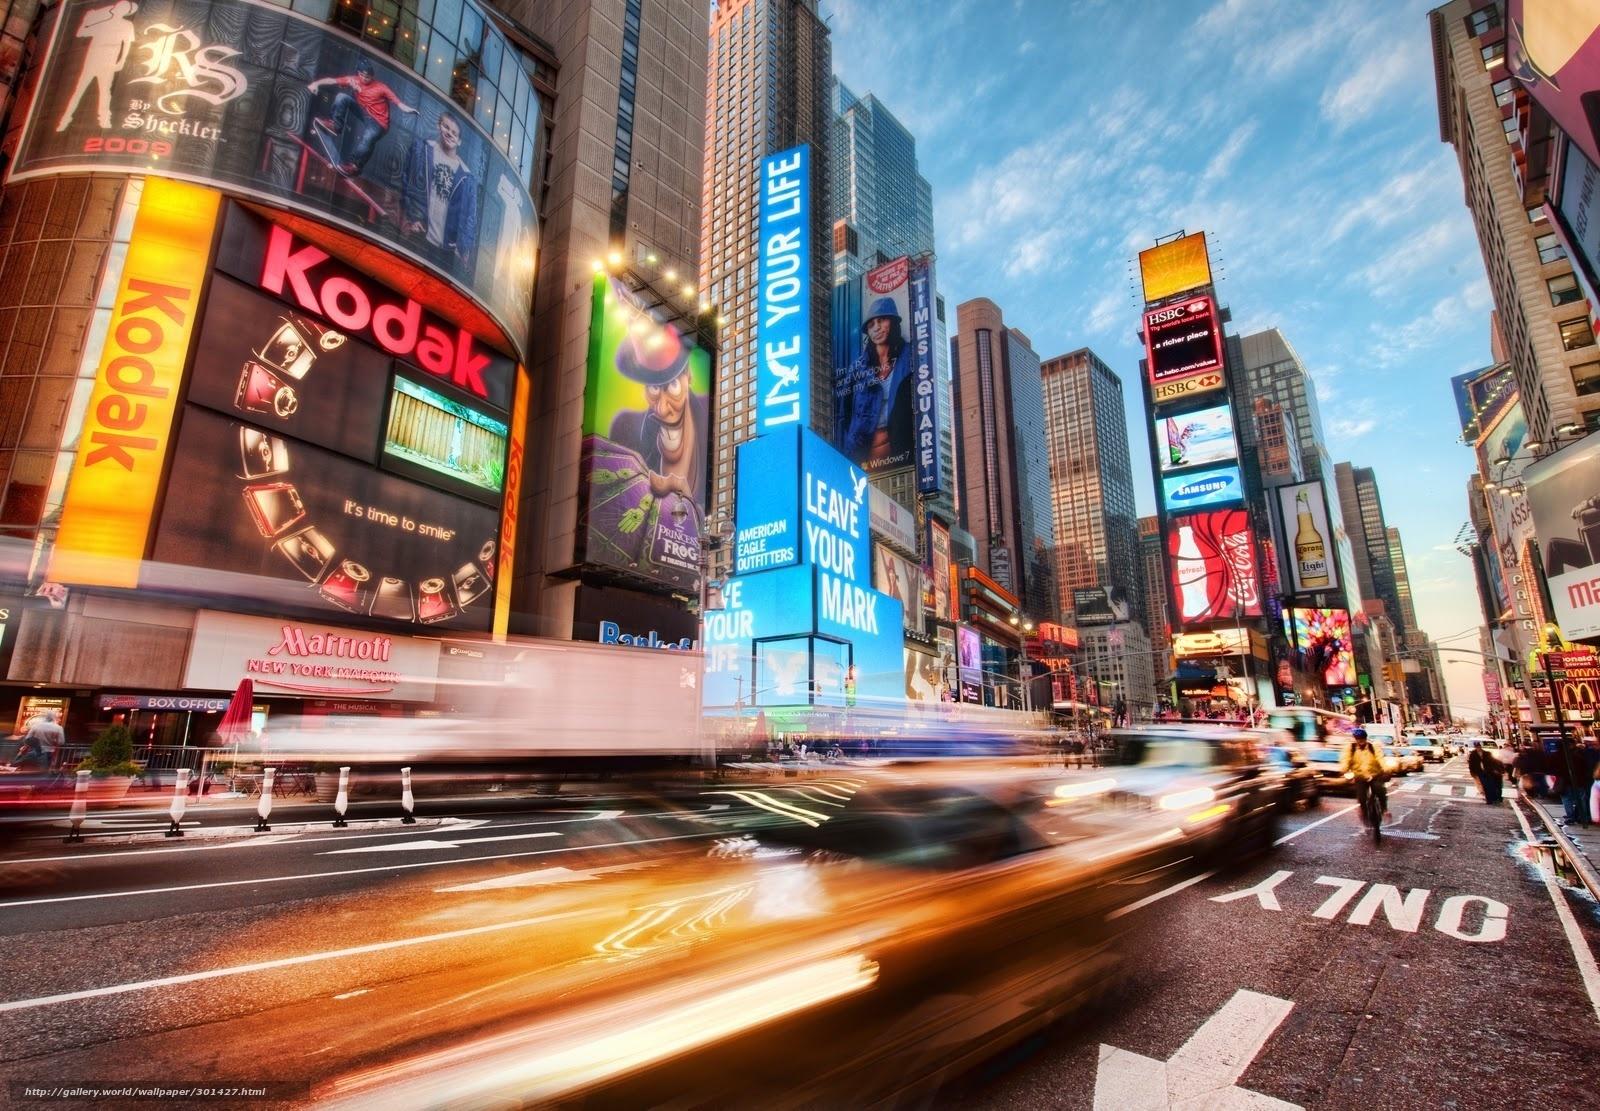 Tlcharger fond d 39 ecran new york city times square action for Photo ecran times square